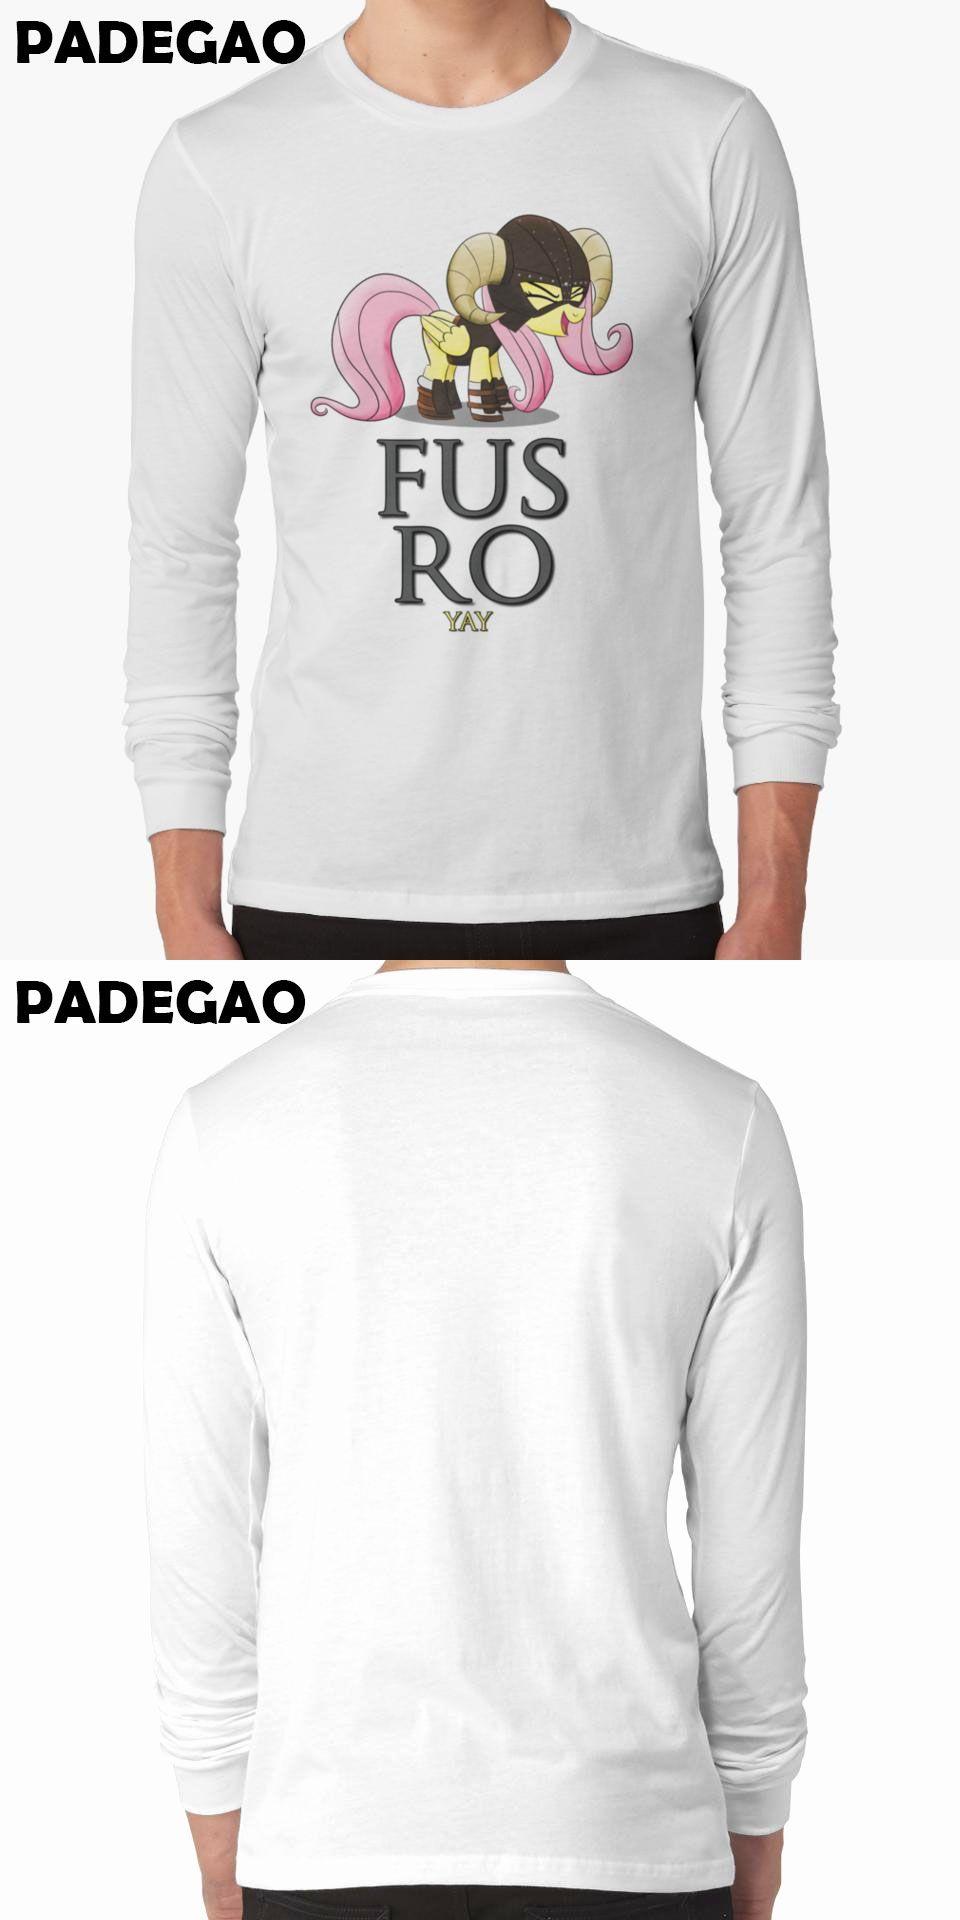 31d8b1fc738e0 FUS RO yay (My Little Pony  Fr Cartoon printed Japan style Tee Shirt White  long sleeve O-neck t-shirts plus size S-3XL R001-CR